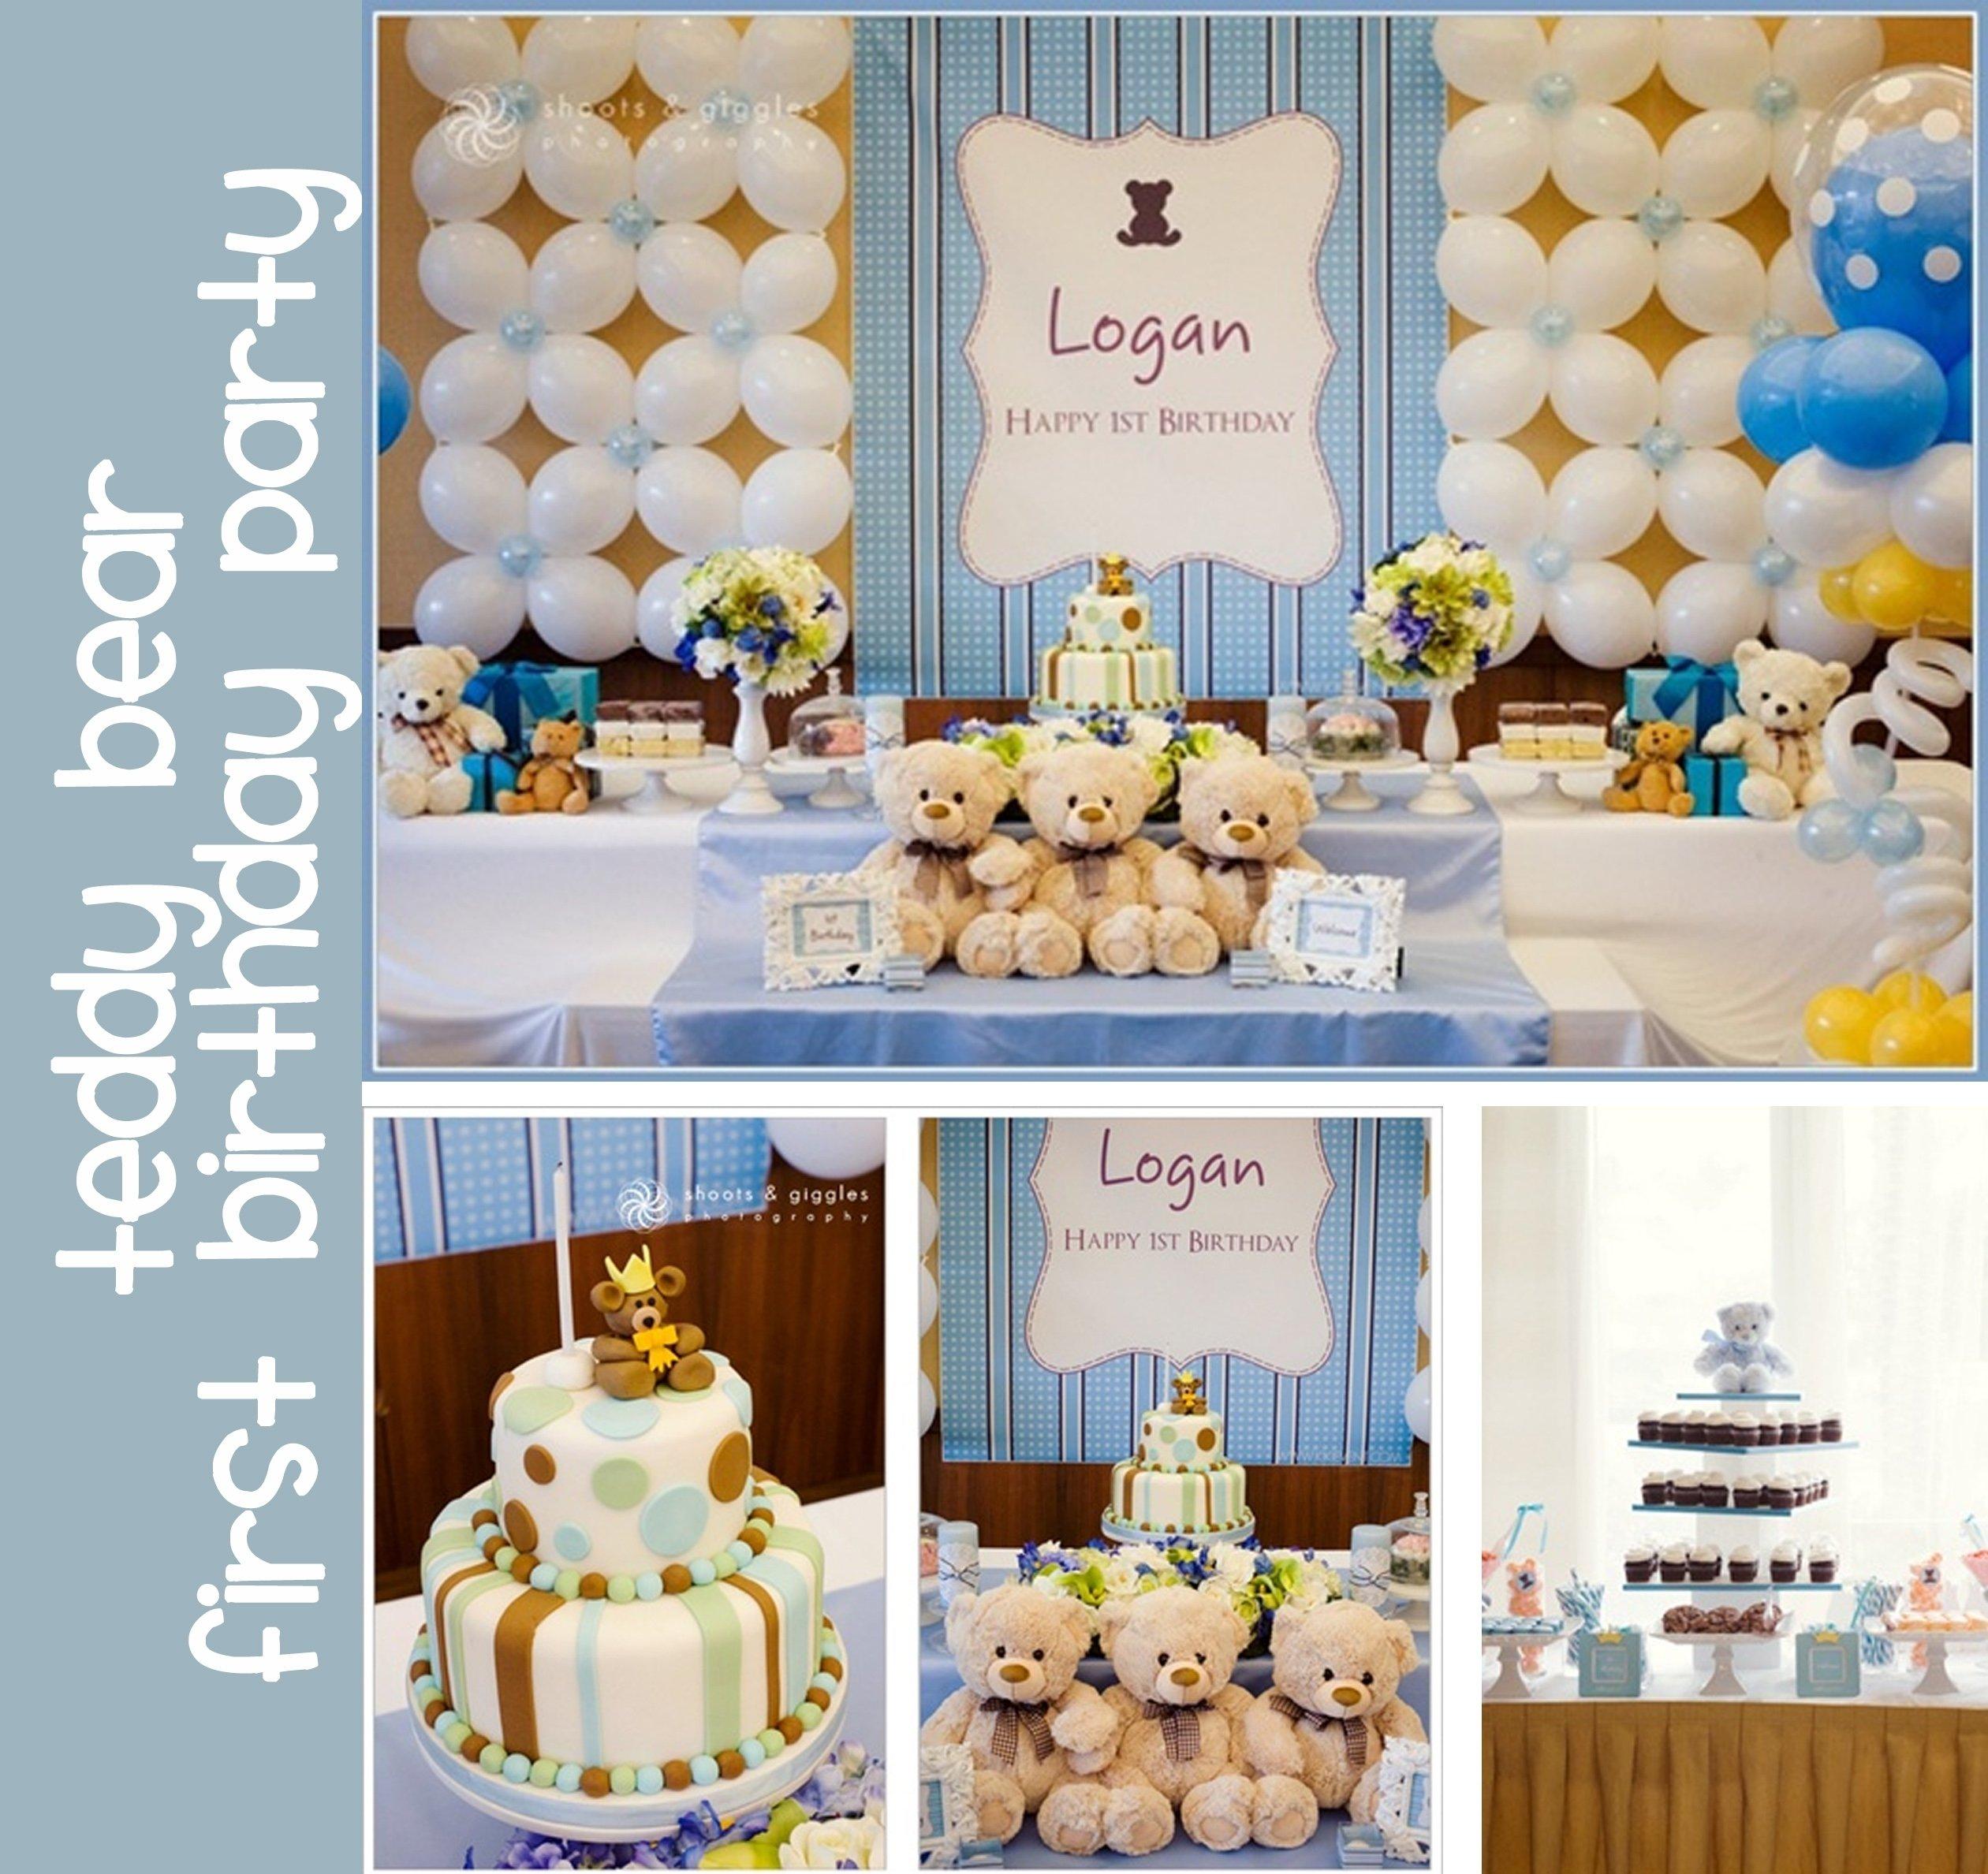 10 Trendy Baby Boy 1St Birthday Ideas baby first birthday ideas for boy first birthday teddy bear theme 18 2021